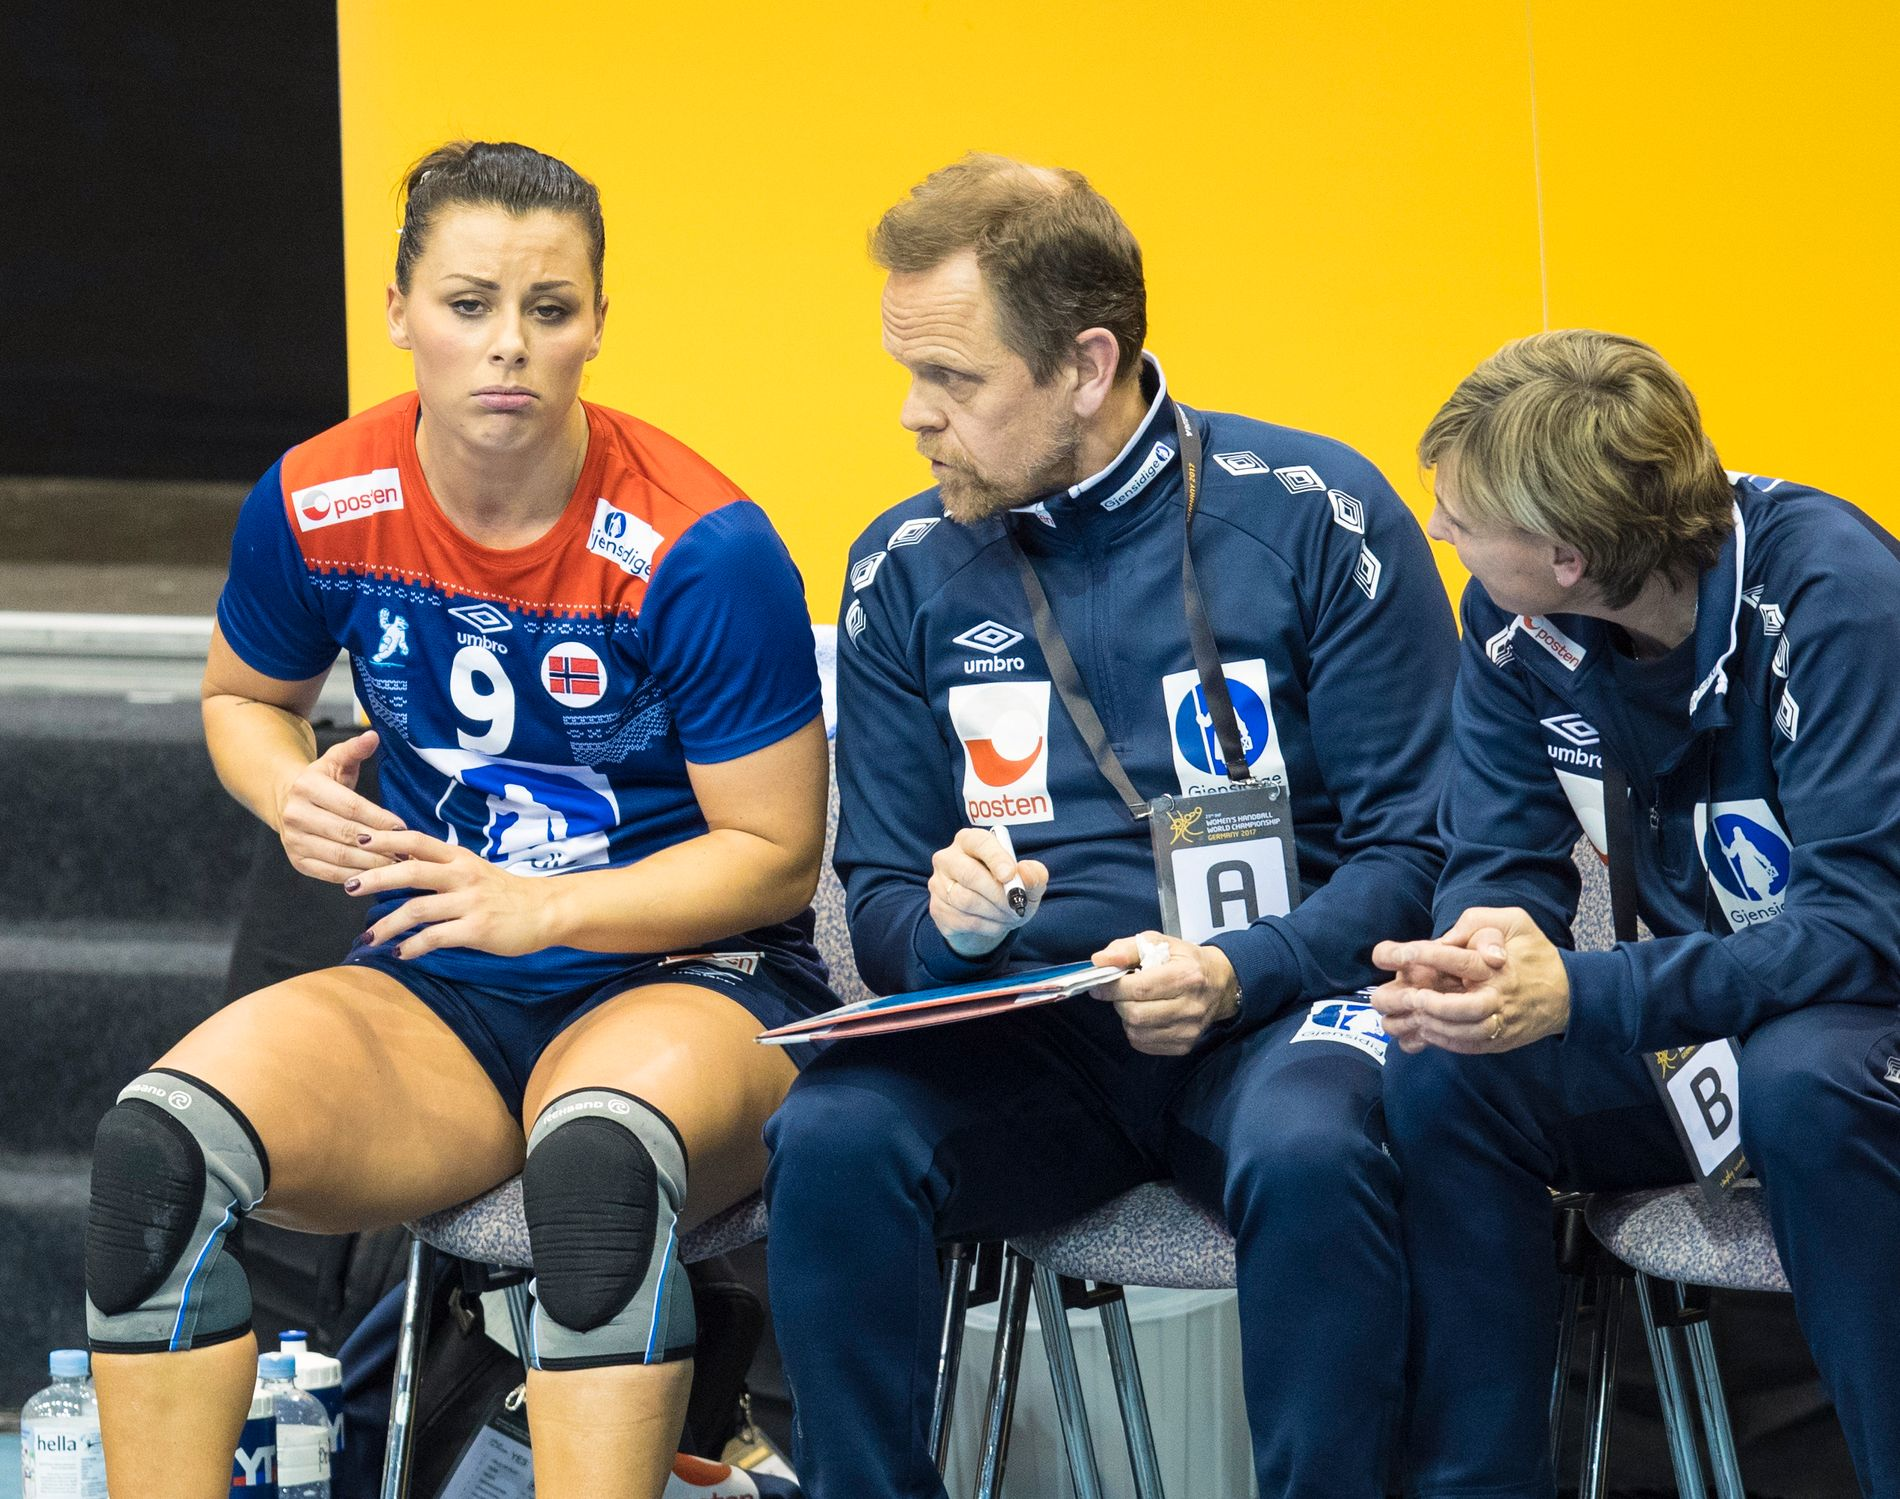 VIKTIG FOR LANDSLAGET: Nora Mørk var en viktig spiller for Thorir Hergeirssons landslag i VM før jul.